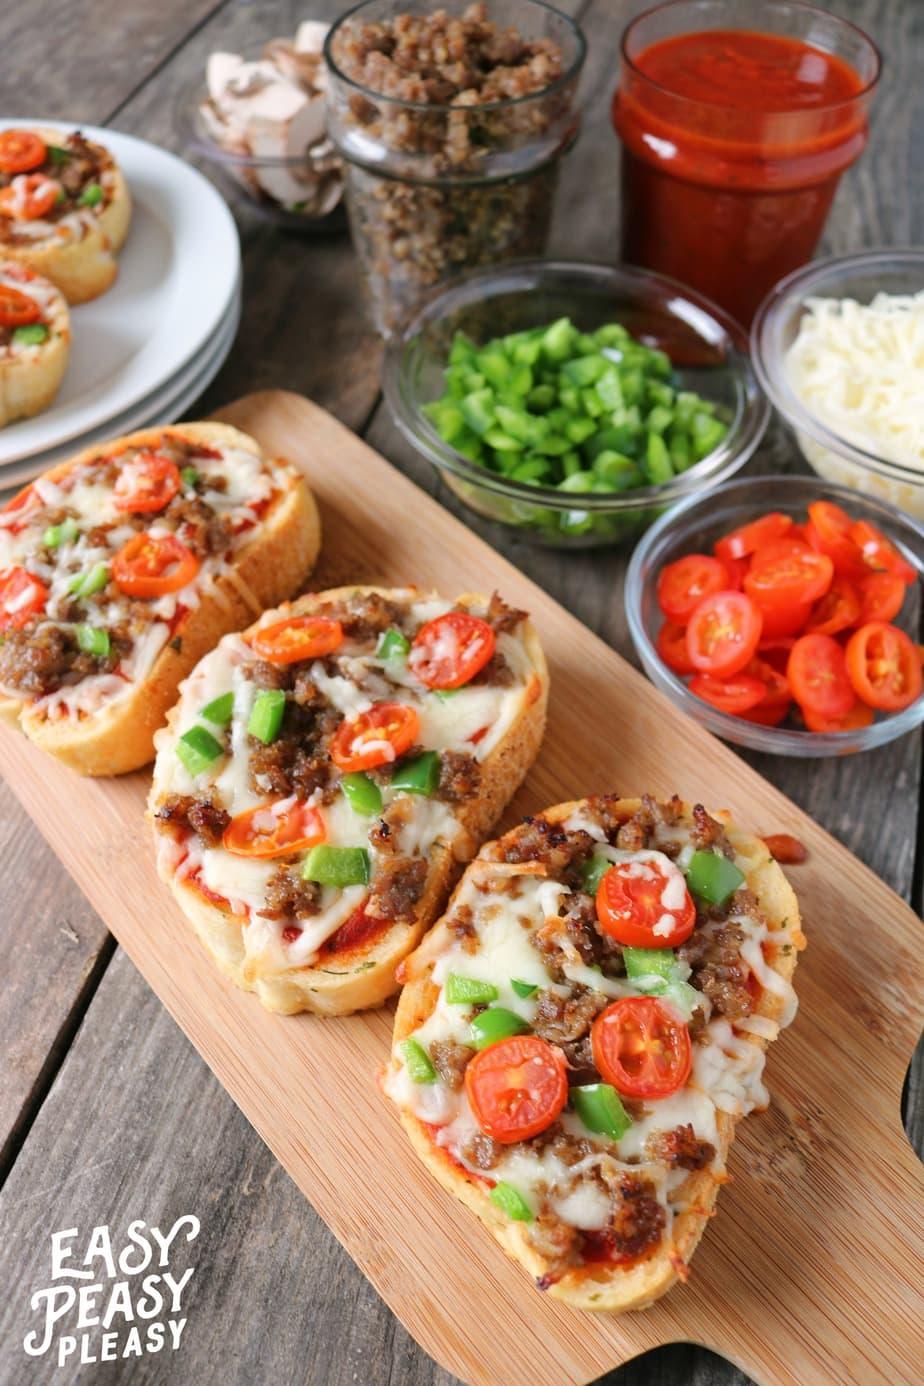 Texas Toast Garlic Bread Pizza For Busy Weeknights Easy Peasy Pleasy